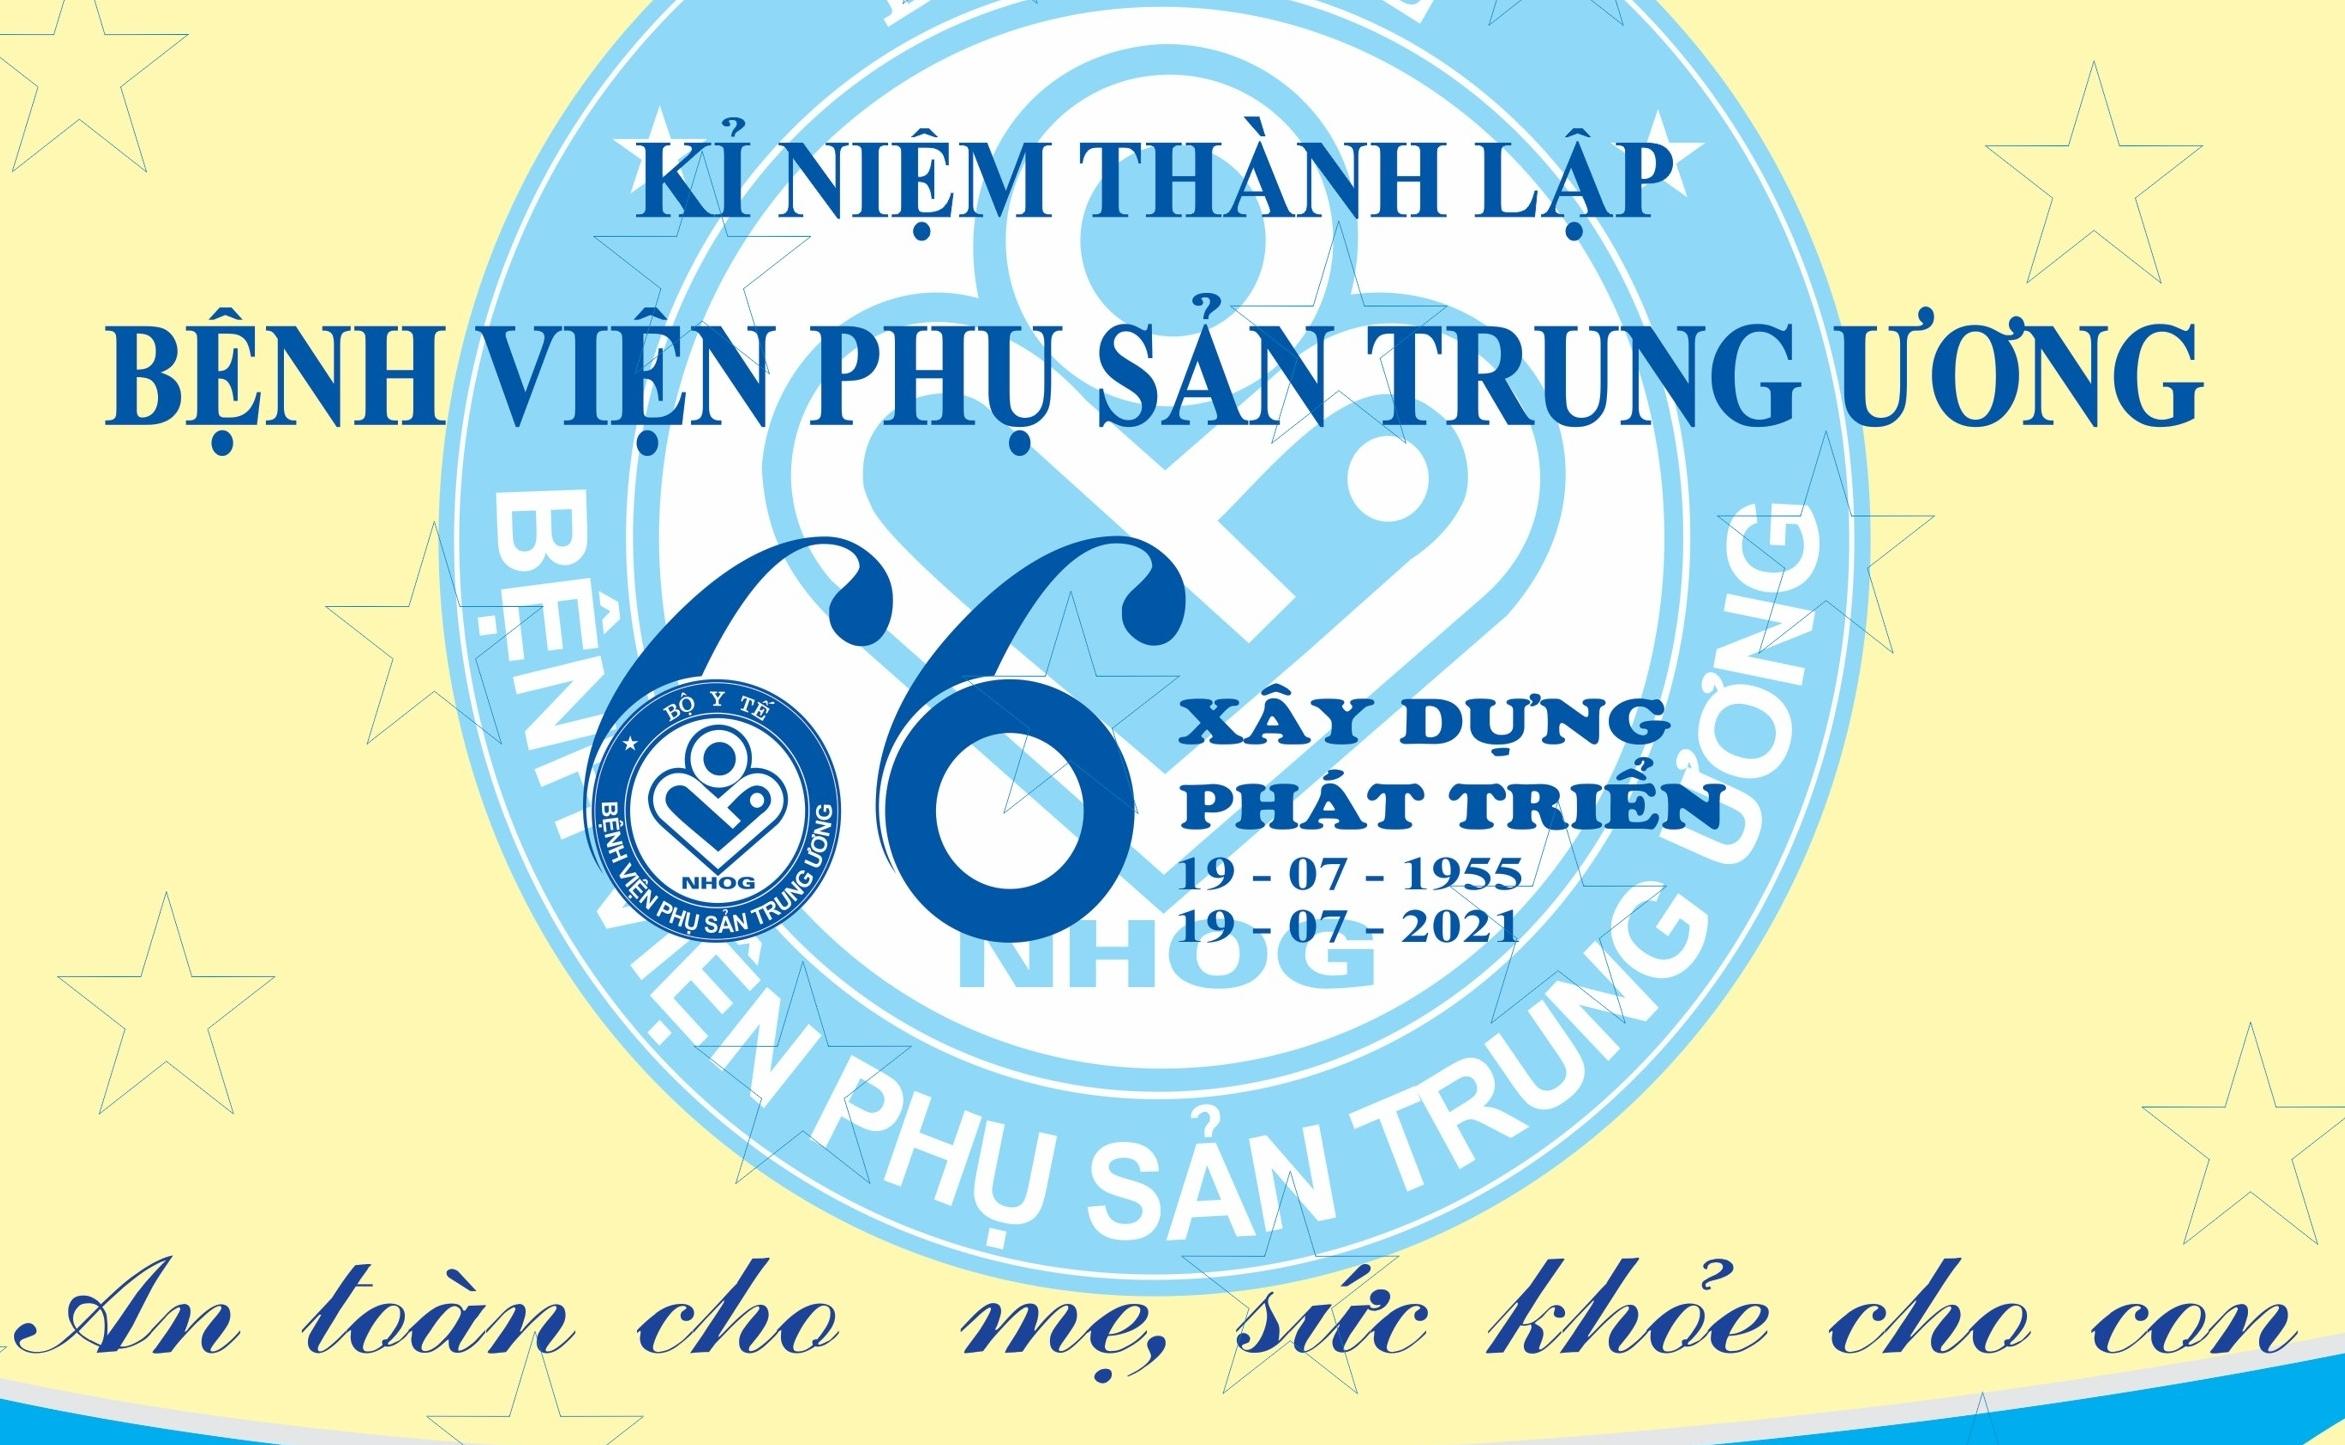 http://benhvienphusantrunguong.org.vn/stores/news_dataimages/vtkien/072021/20/08/croped/Picture1.jpg